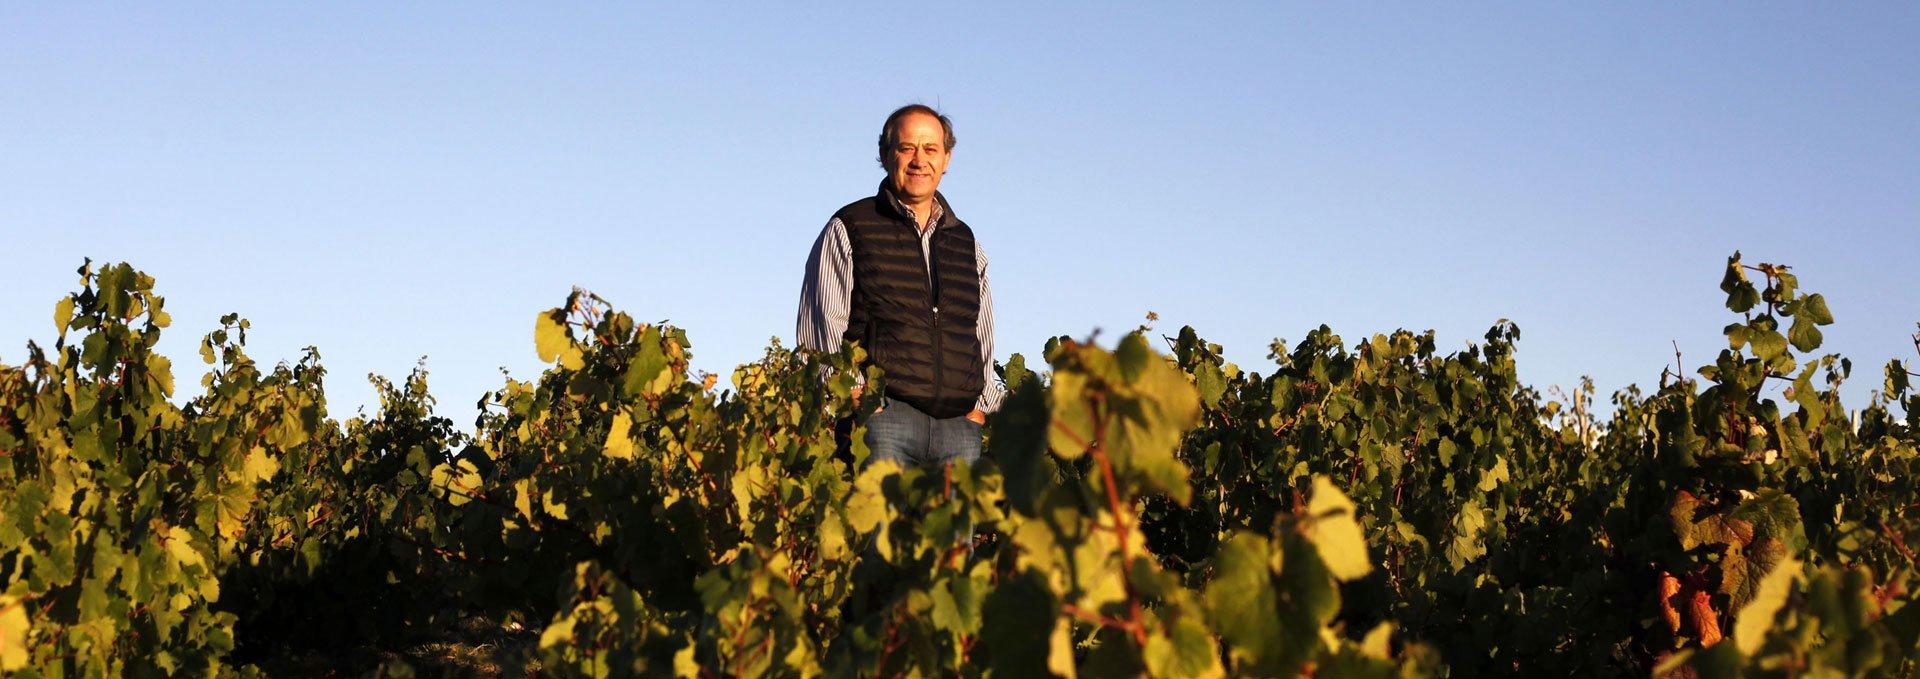 Edy in the vineyard